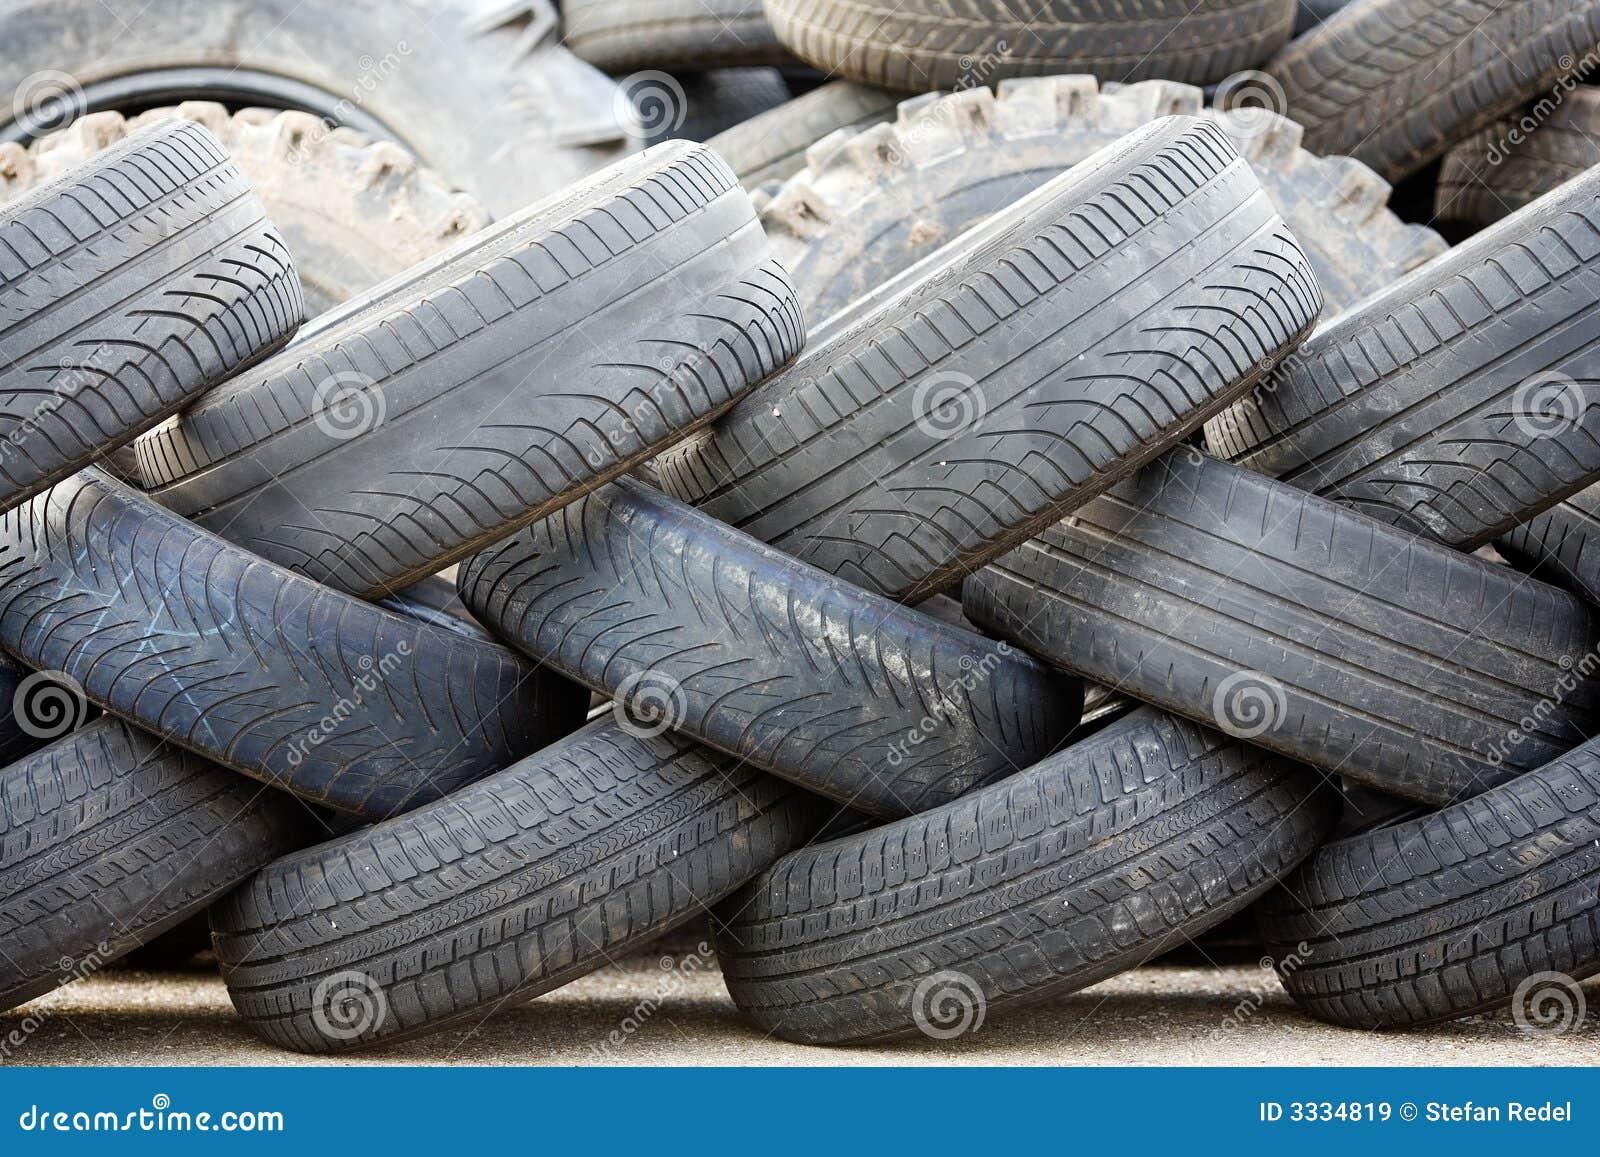 old used tires stock image image of stack bunch rubber 3334819. Black Bedroom Furniture Sets. Home Design Ideas